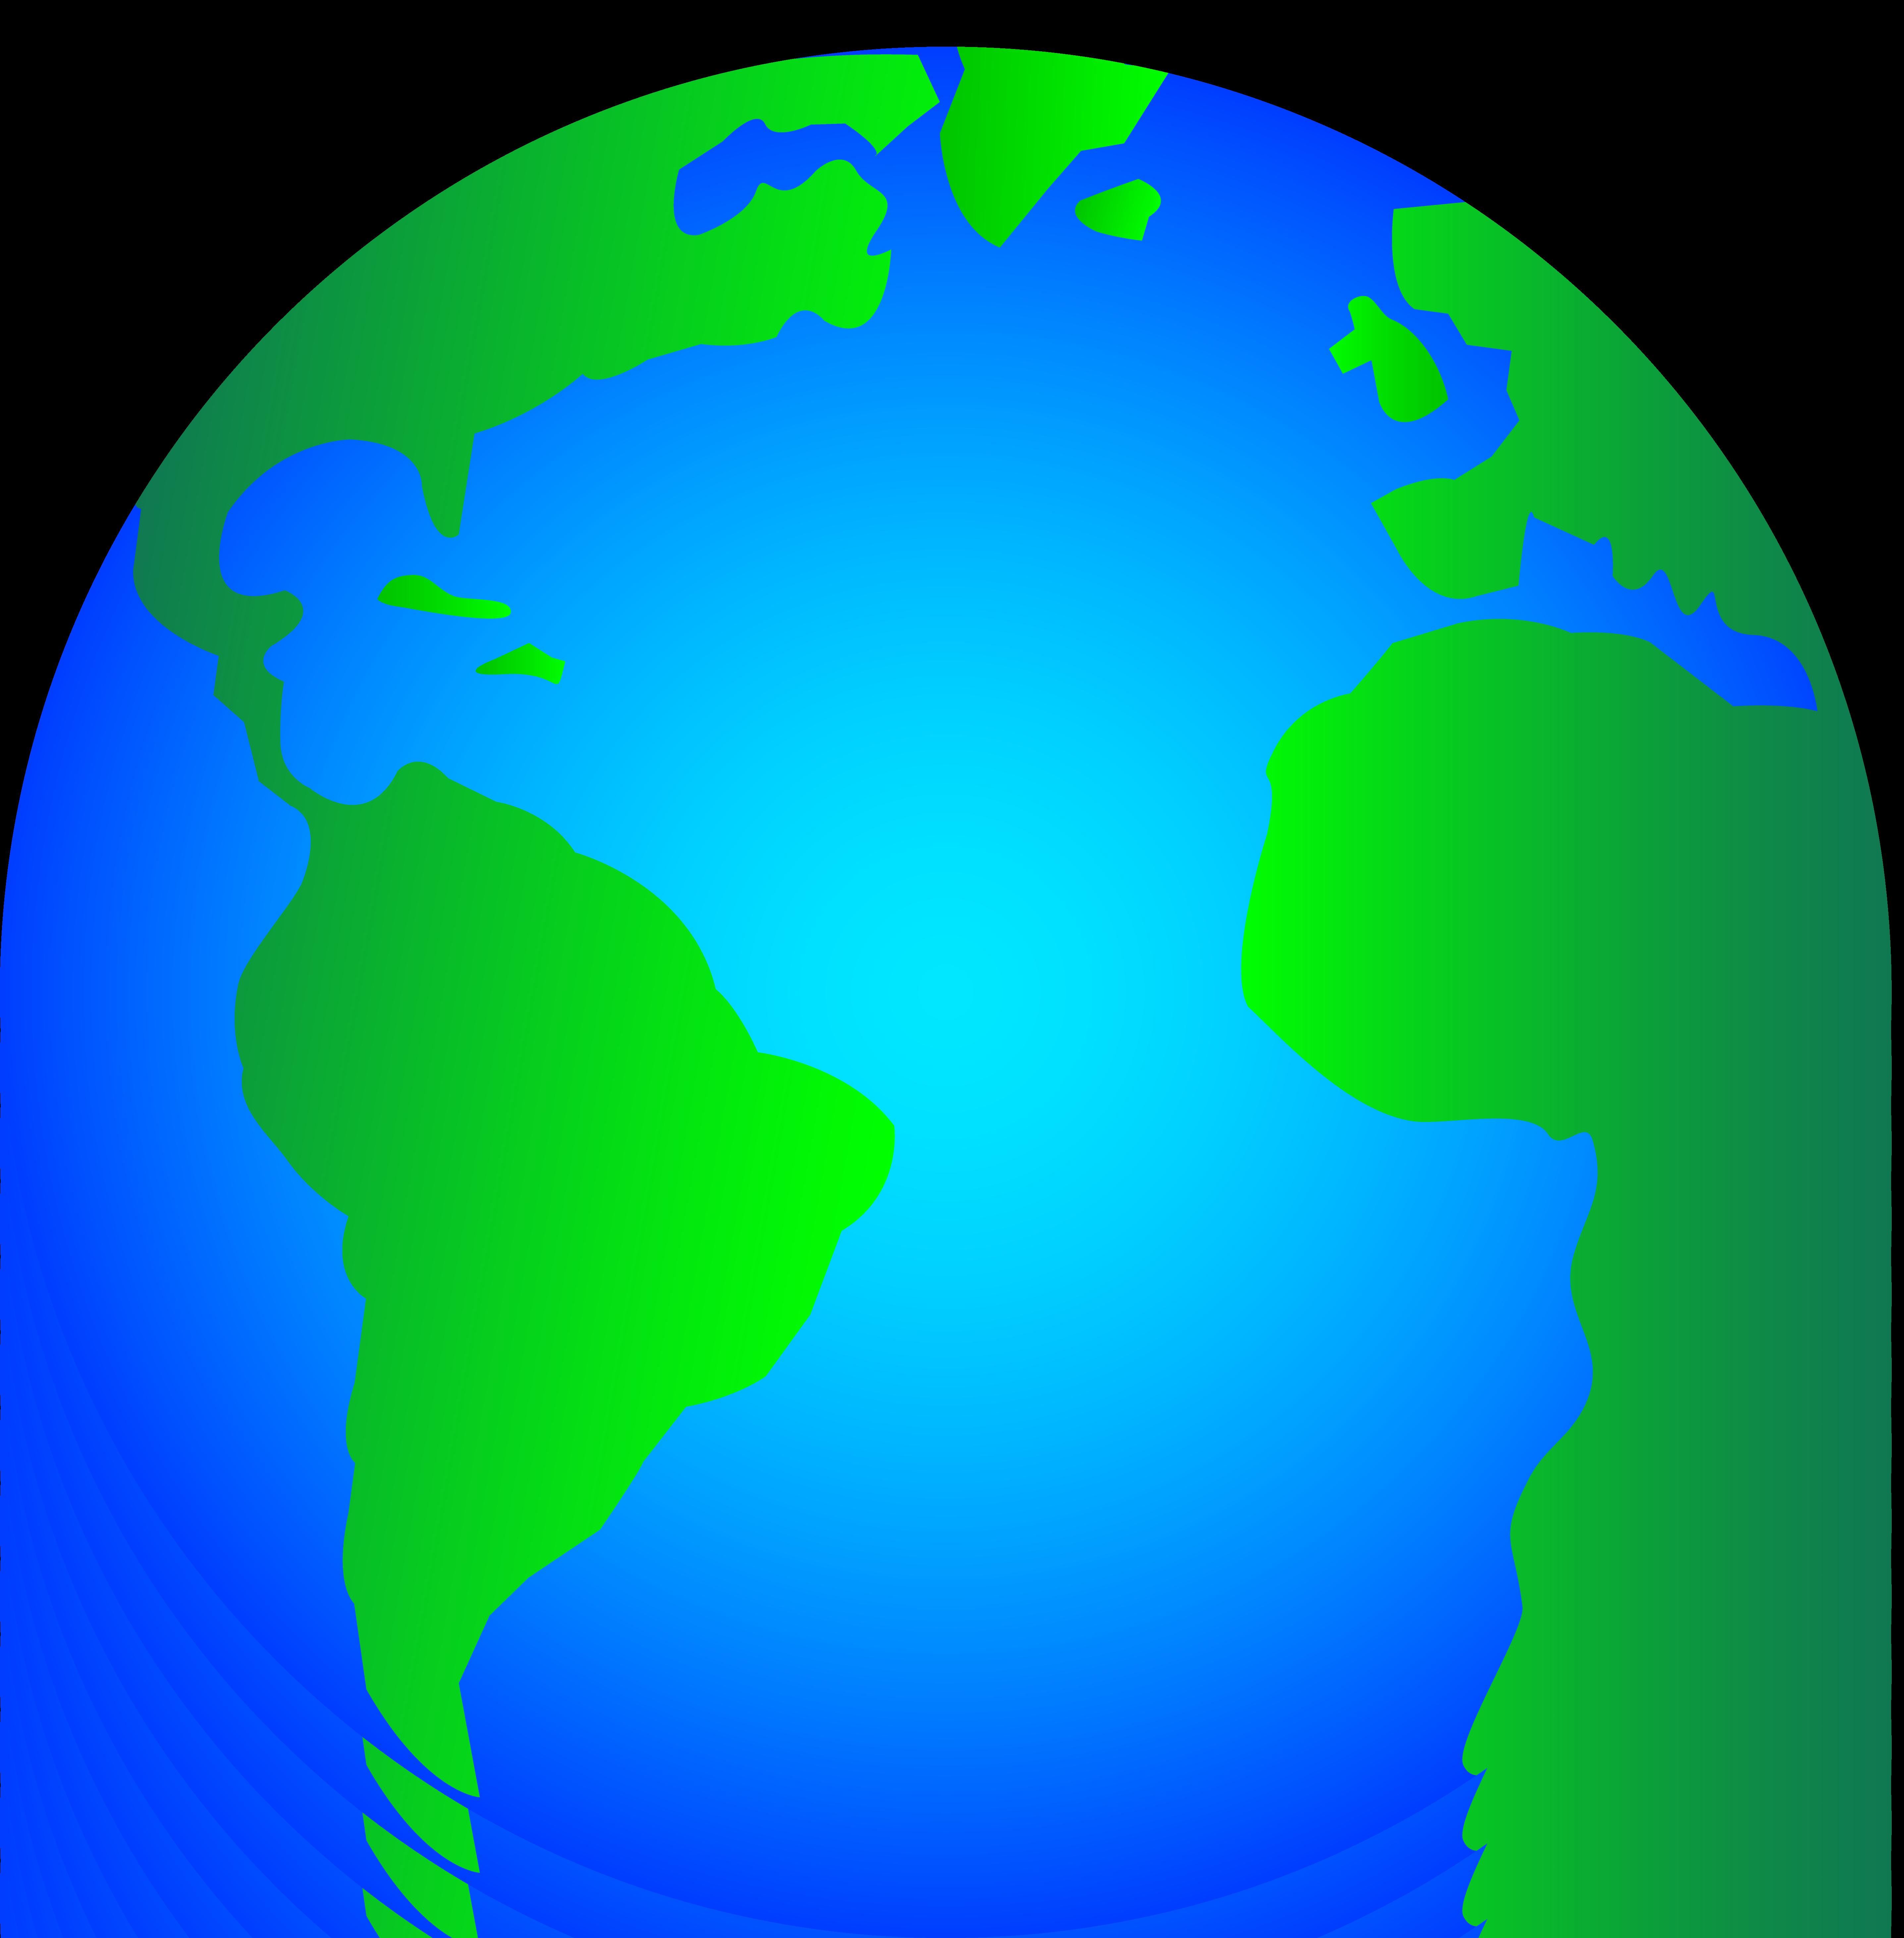 Planet Earth Shiny Logo - Free .-Planet Earth Shiny Logo - Free .-6